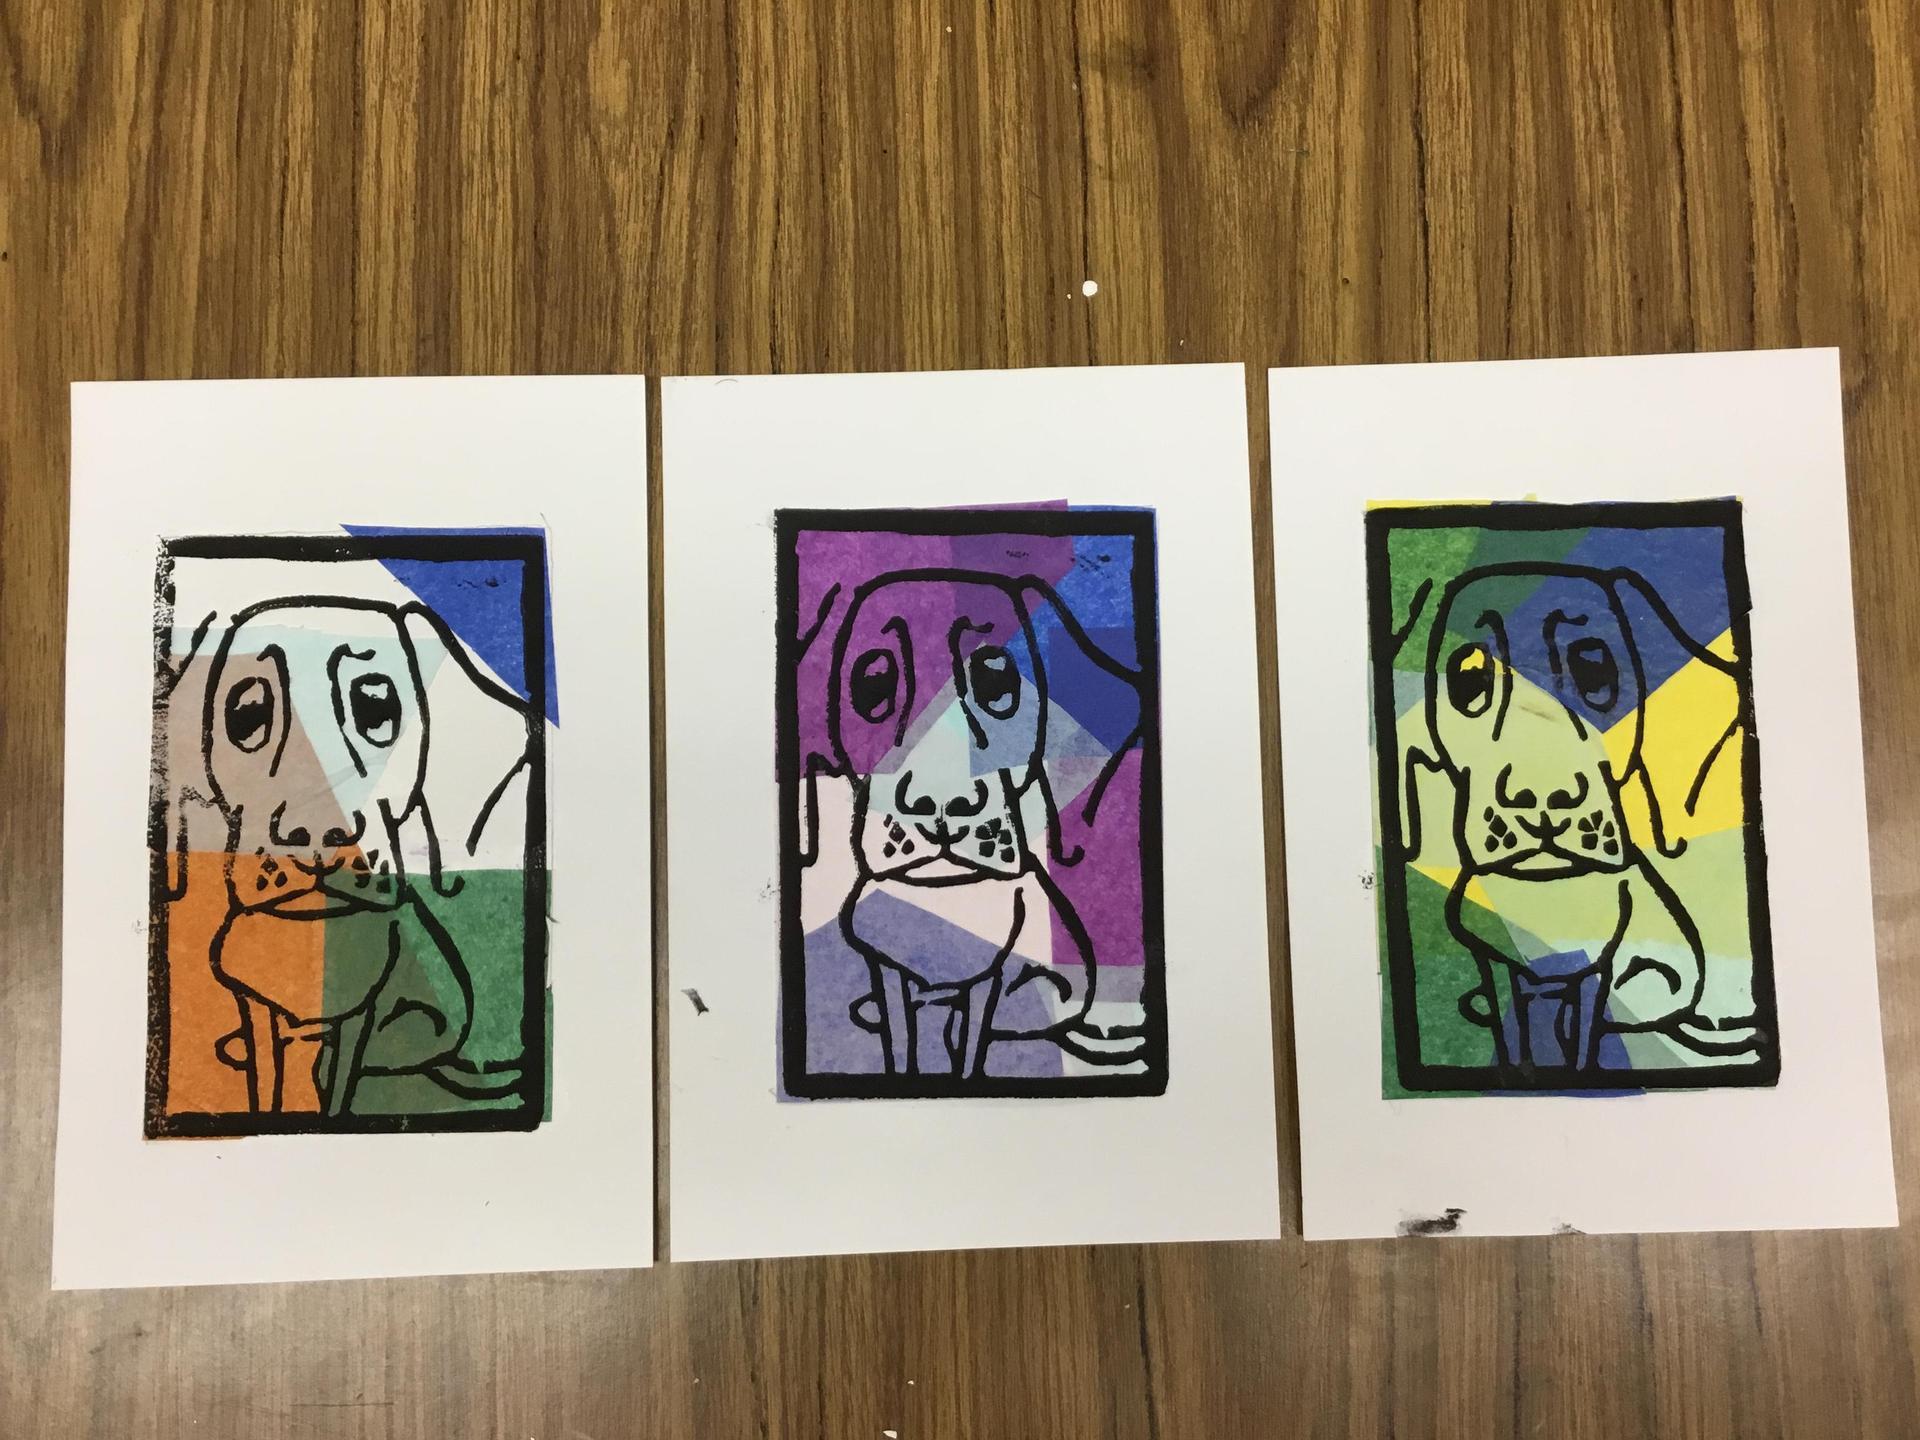 Set of three prints